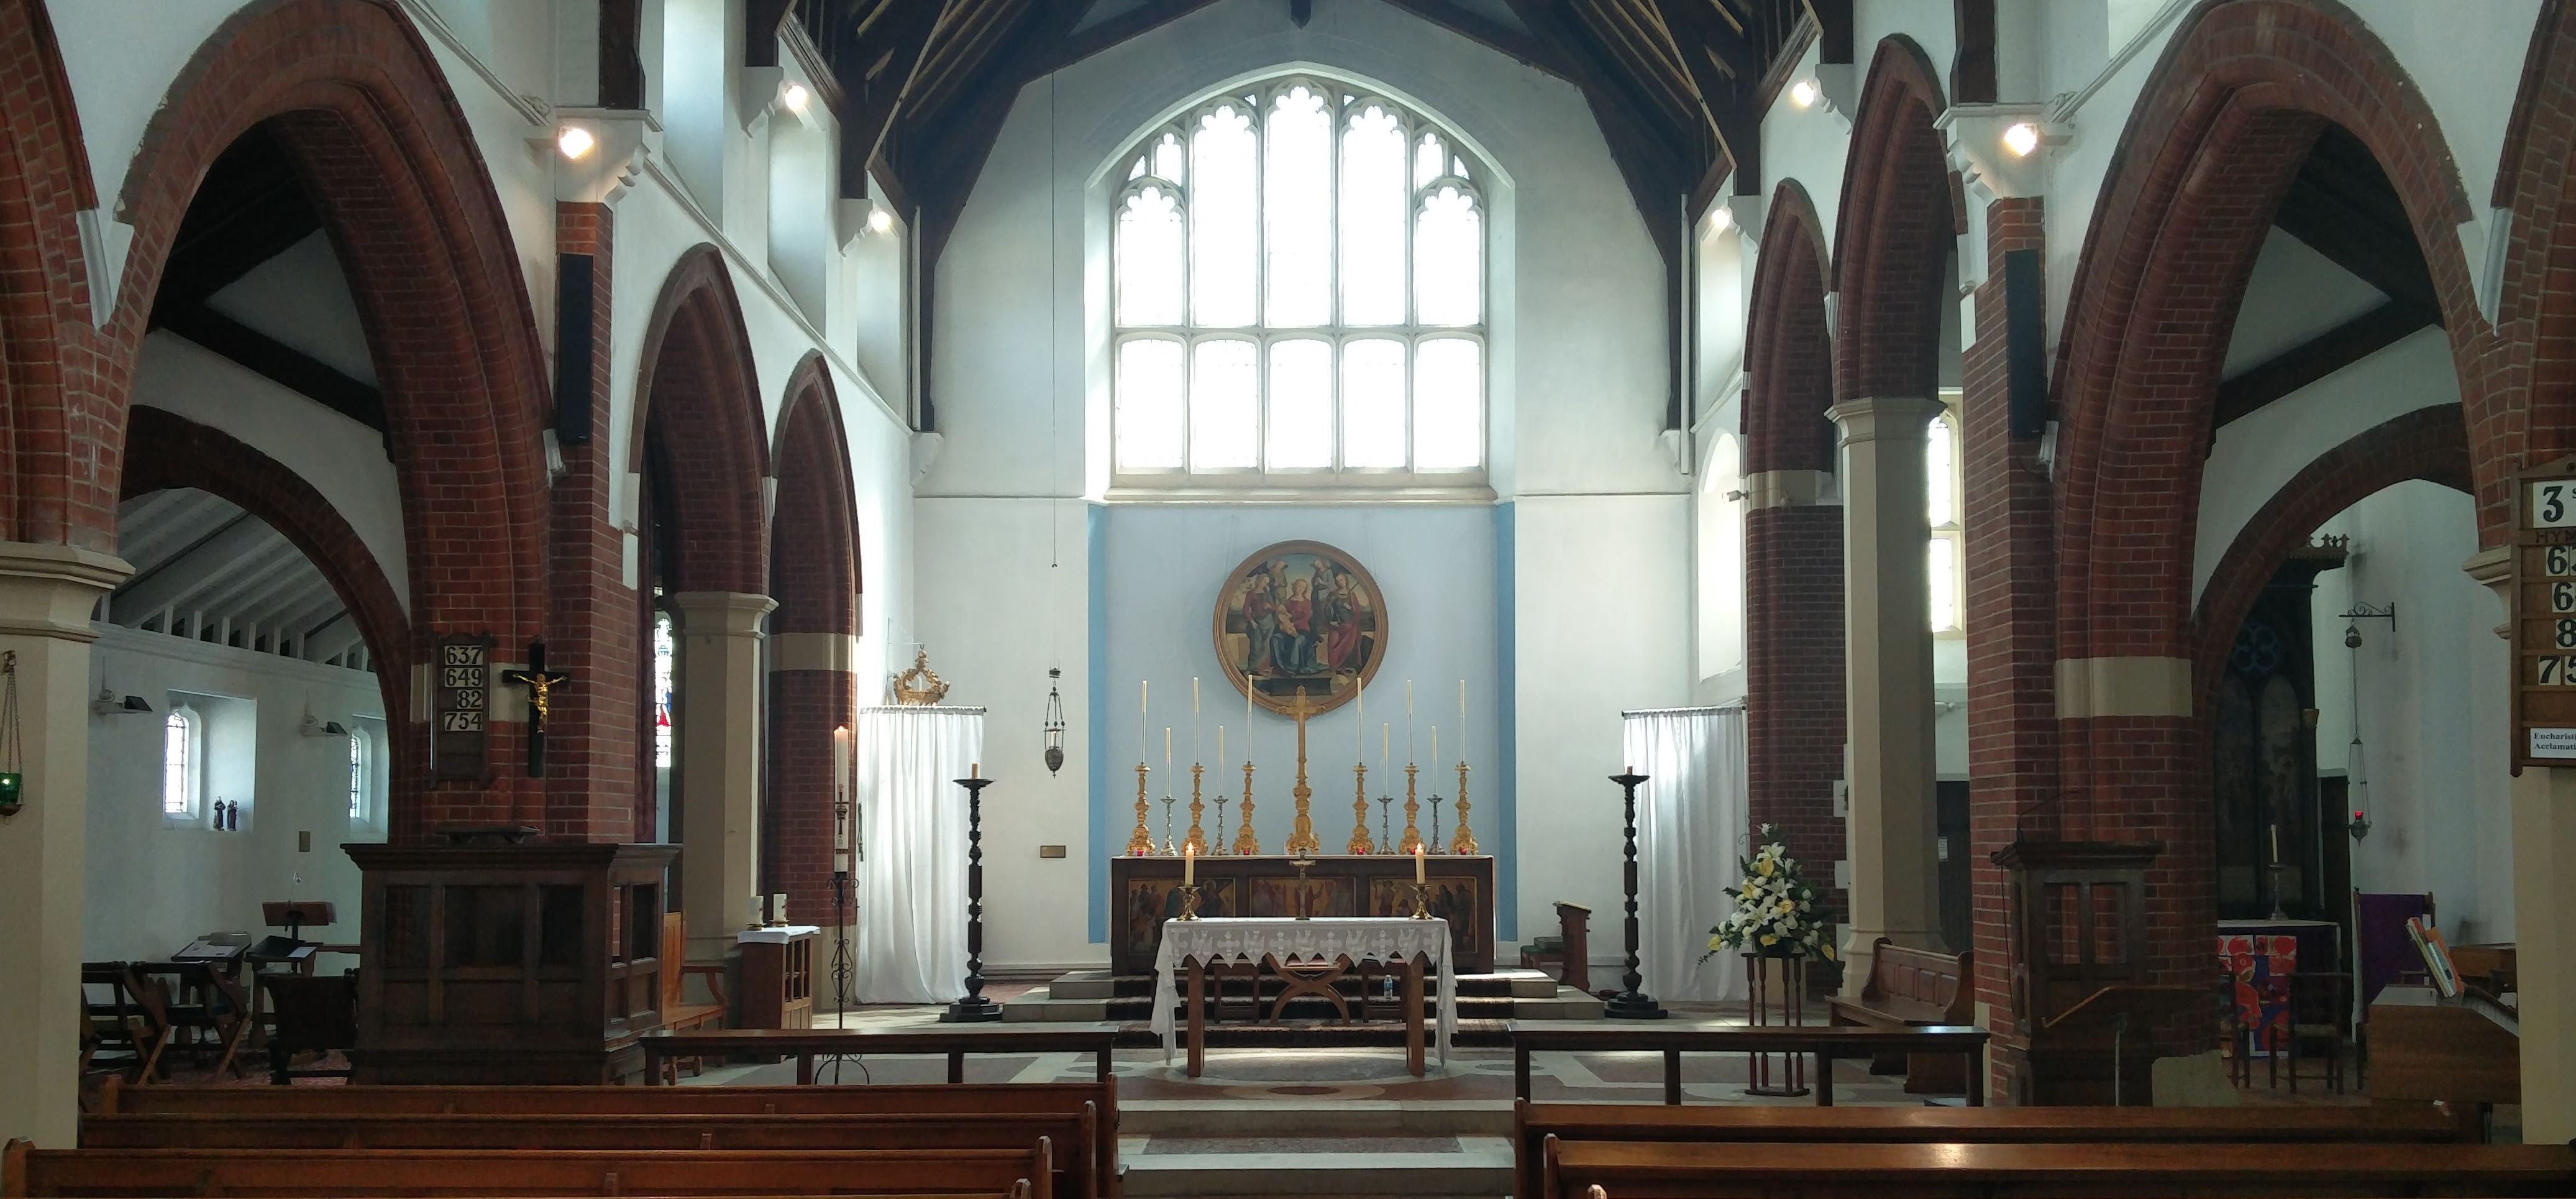 Saint Luke the Evangelist, Gillingham, Kent